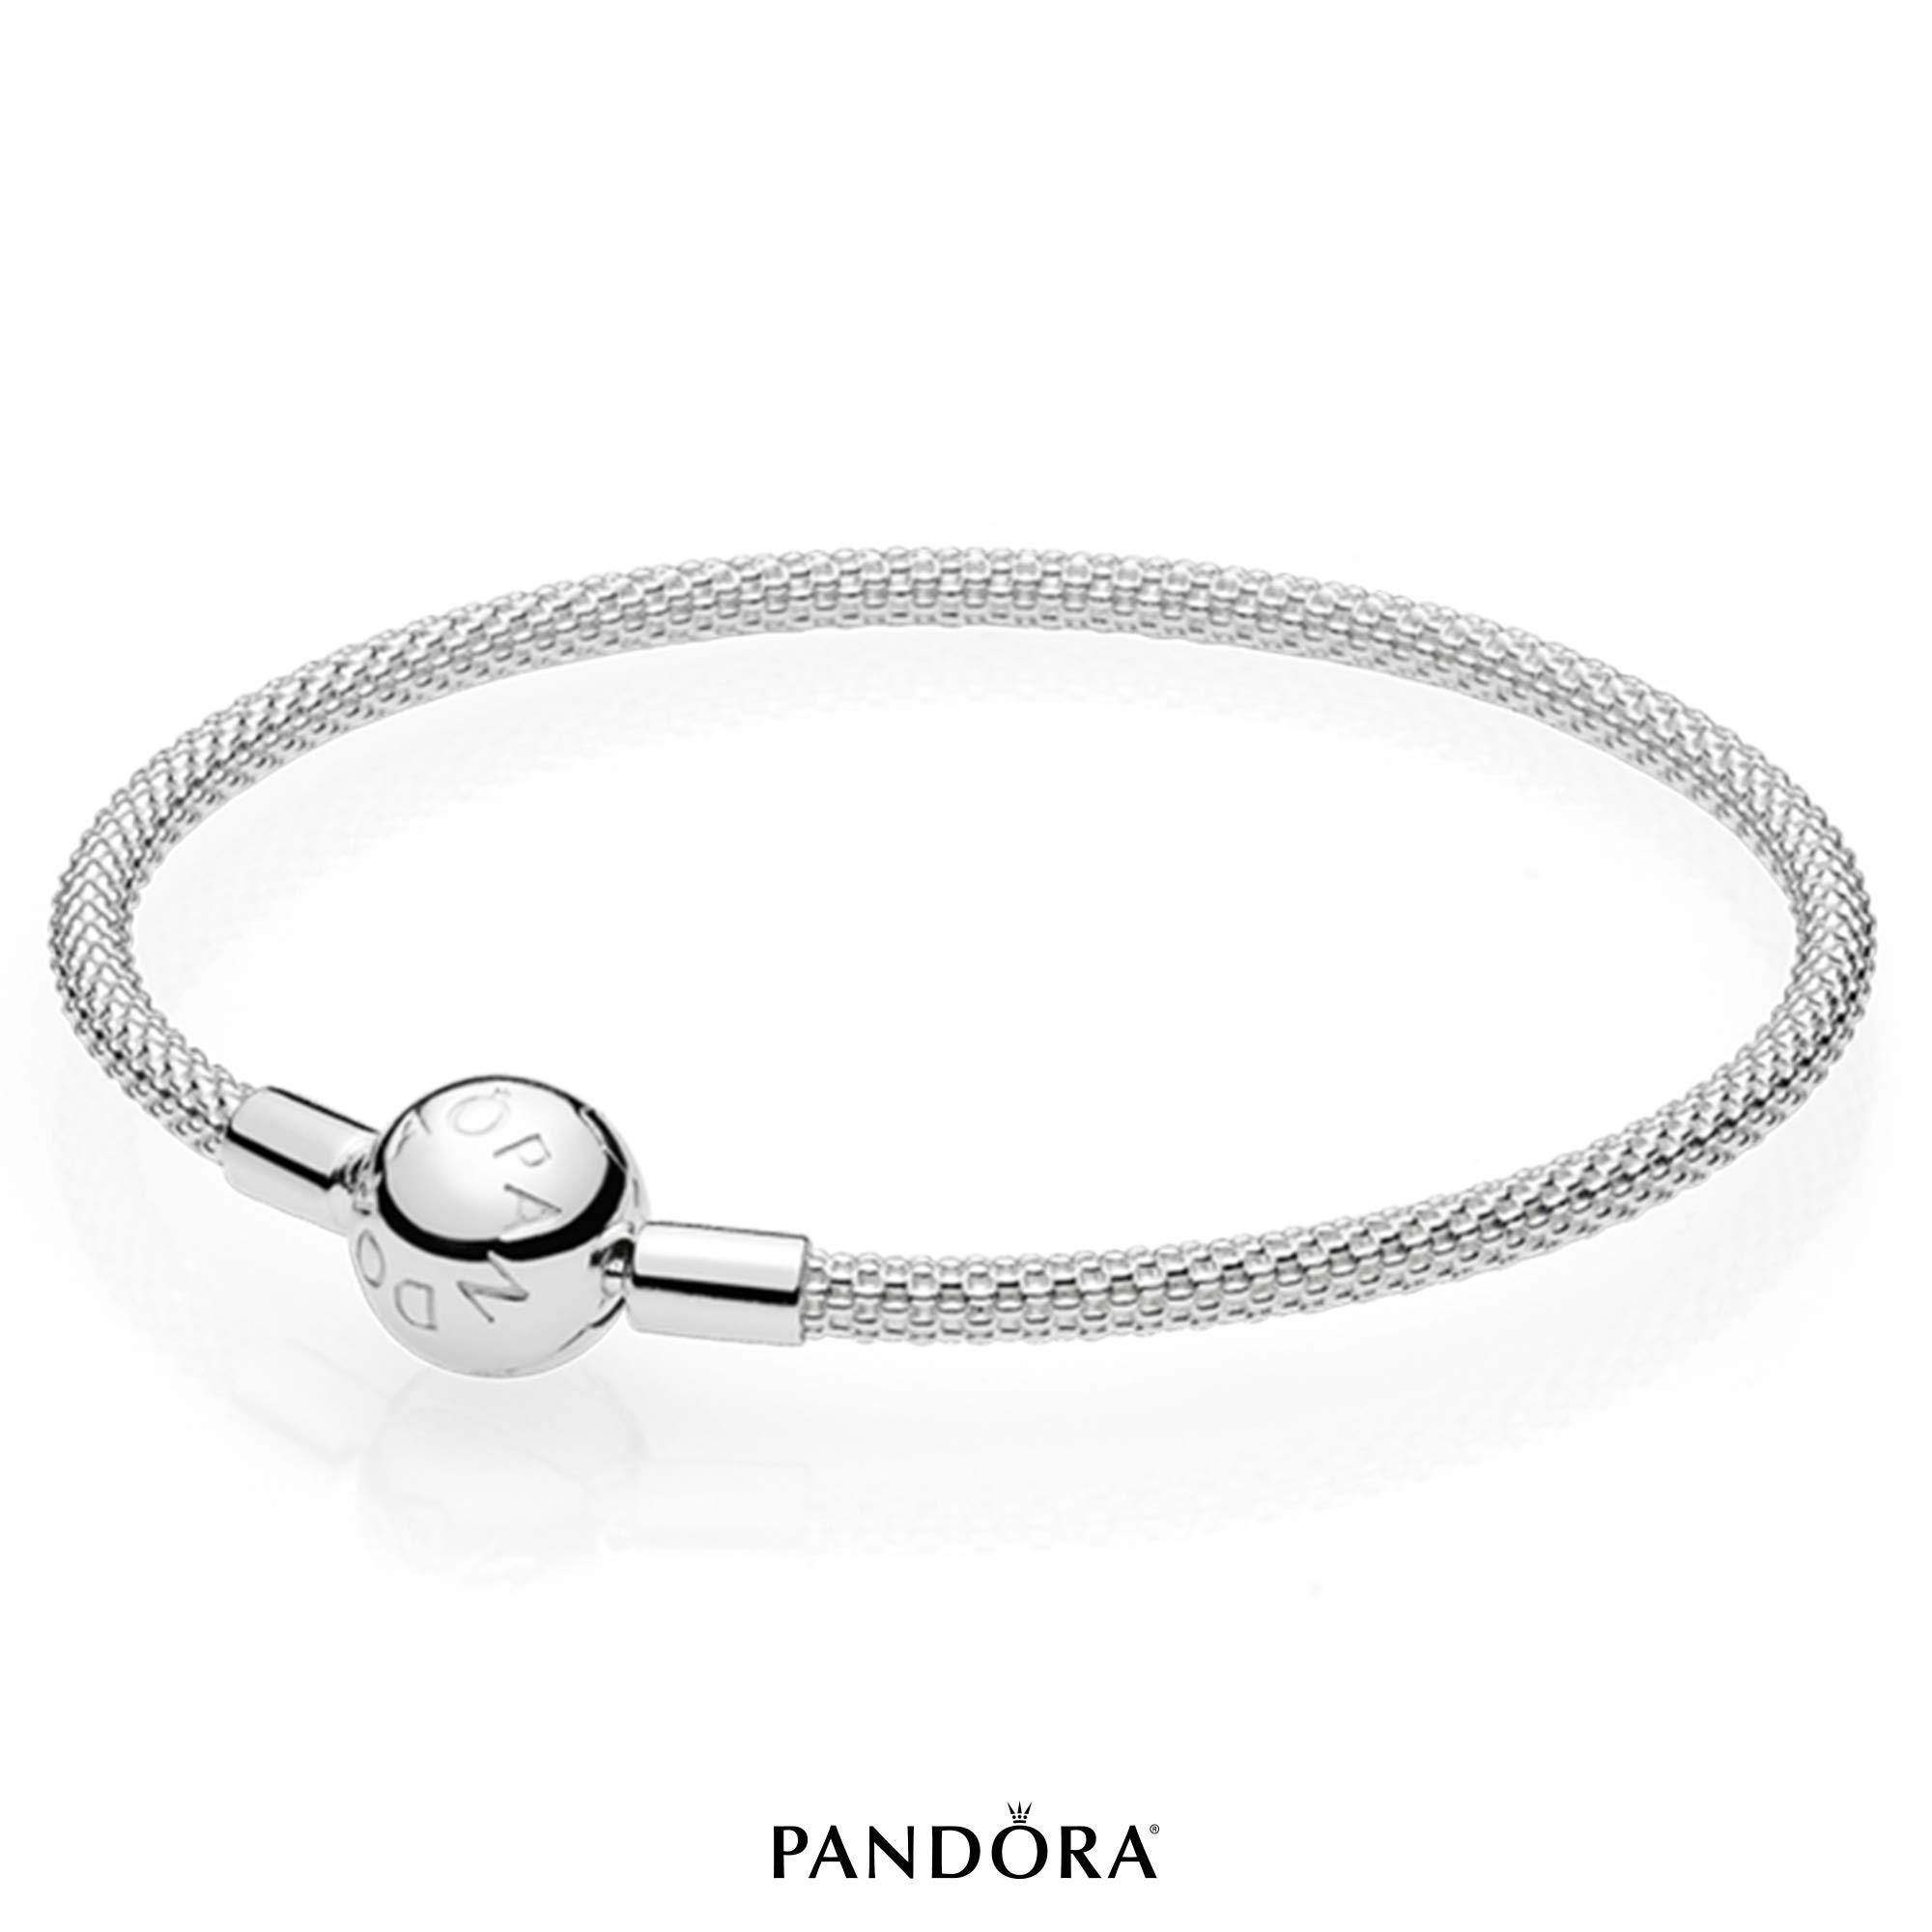 PANDORA Sterling Silver Mesh Bracelet, 7.5 IN by PANDORA